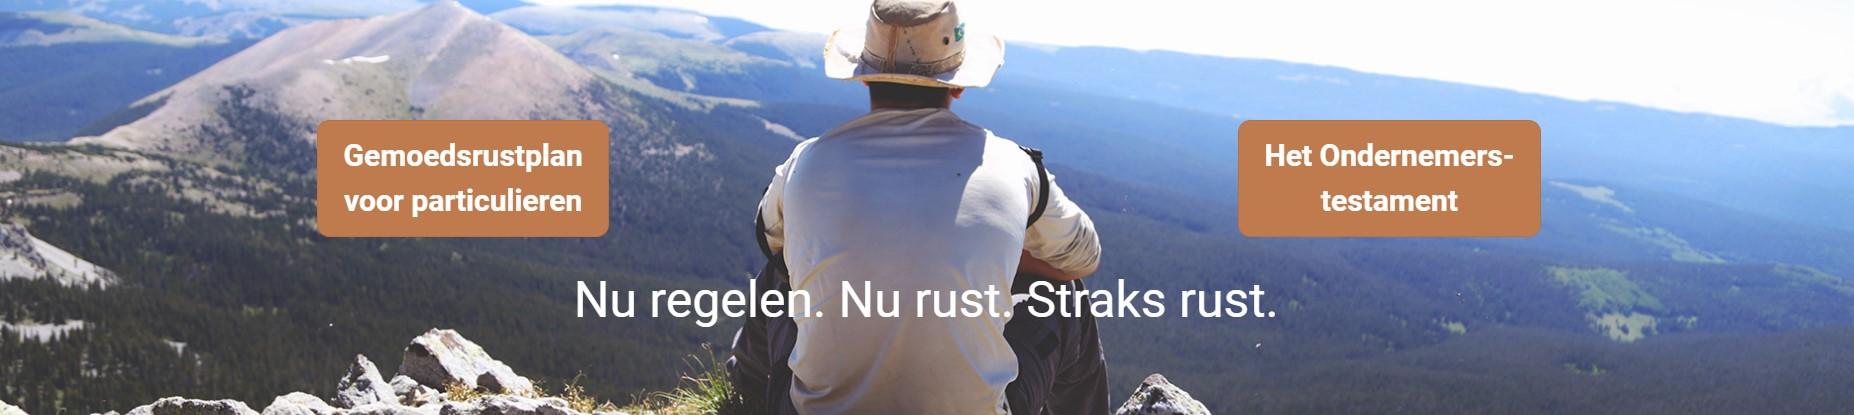 GEMOEDSRUSTPLAN.NL